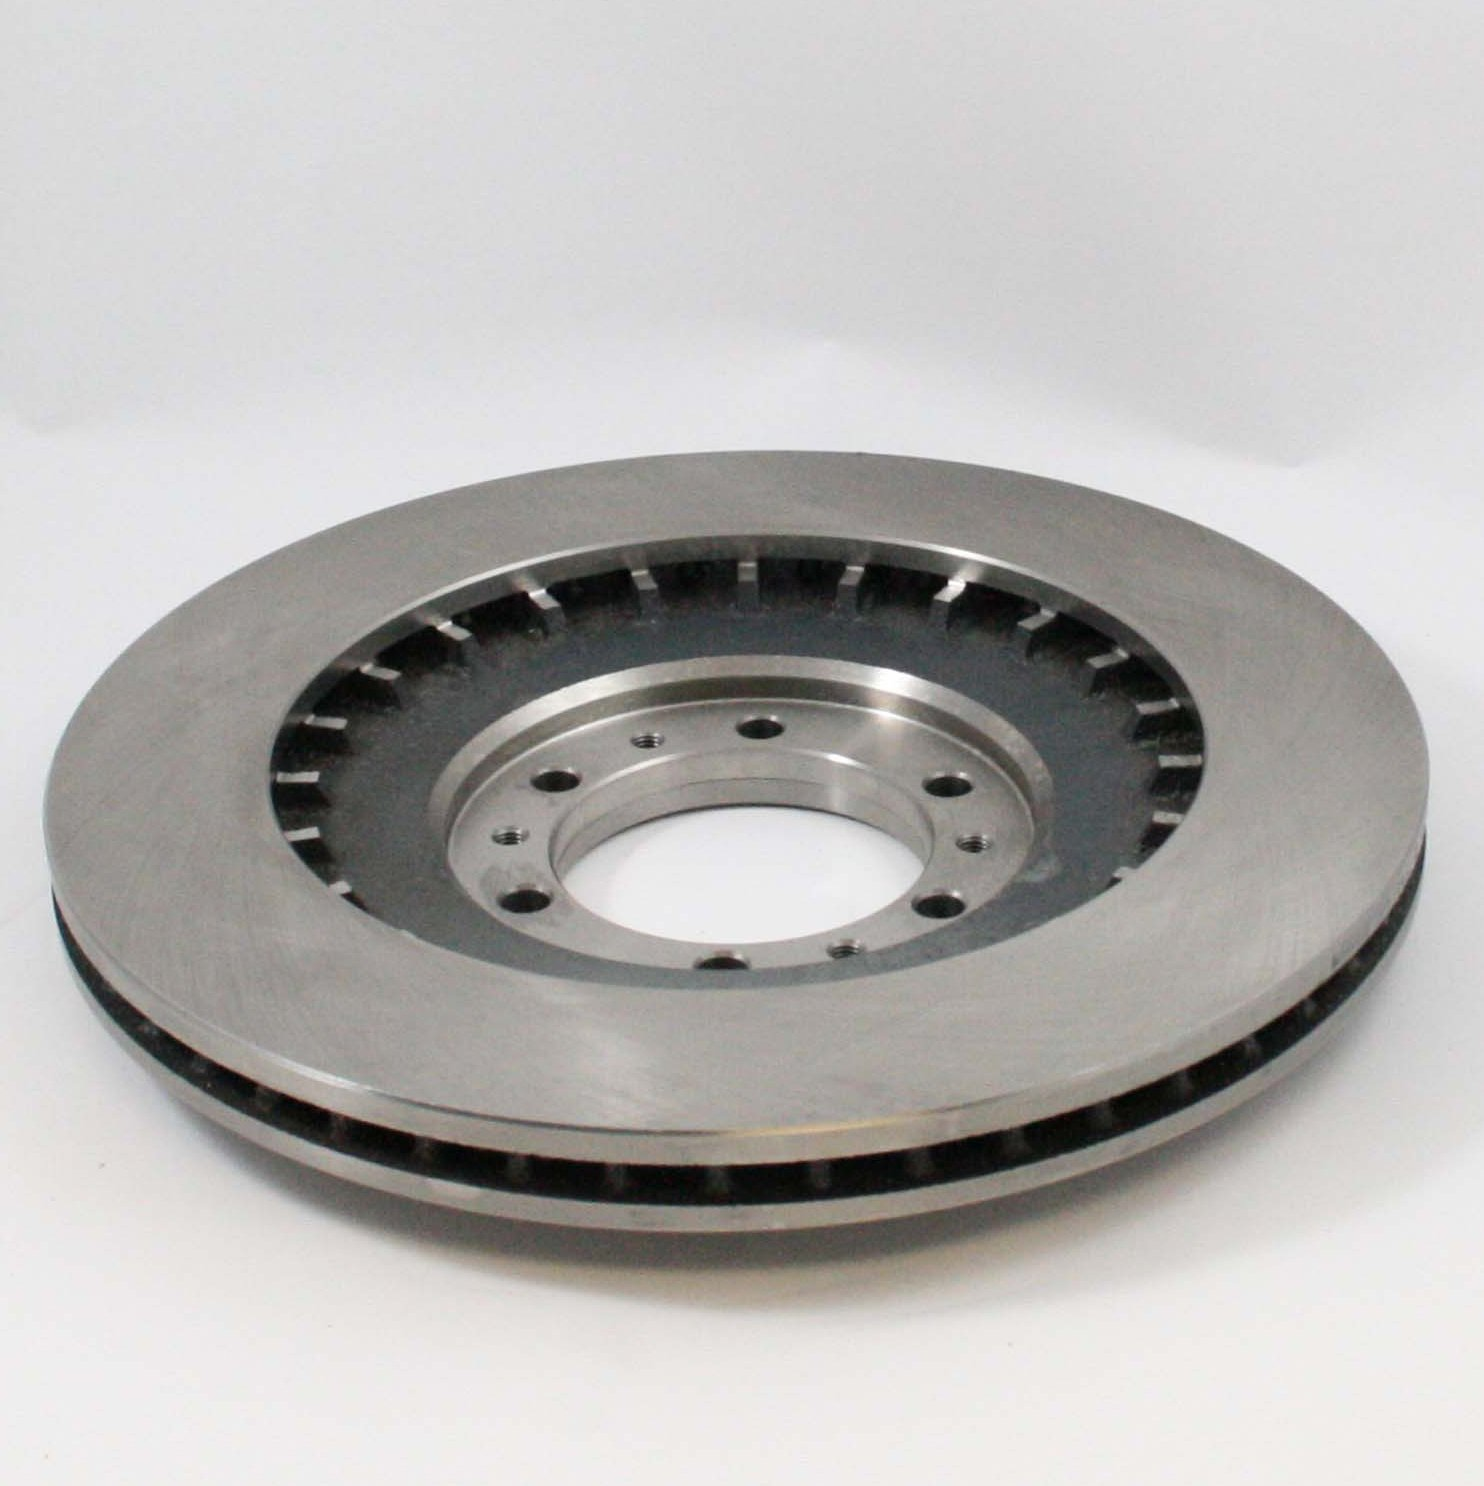 DuraGo BR31291 Front Vented Disc Brake Rotor